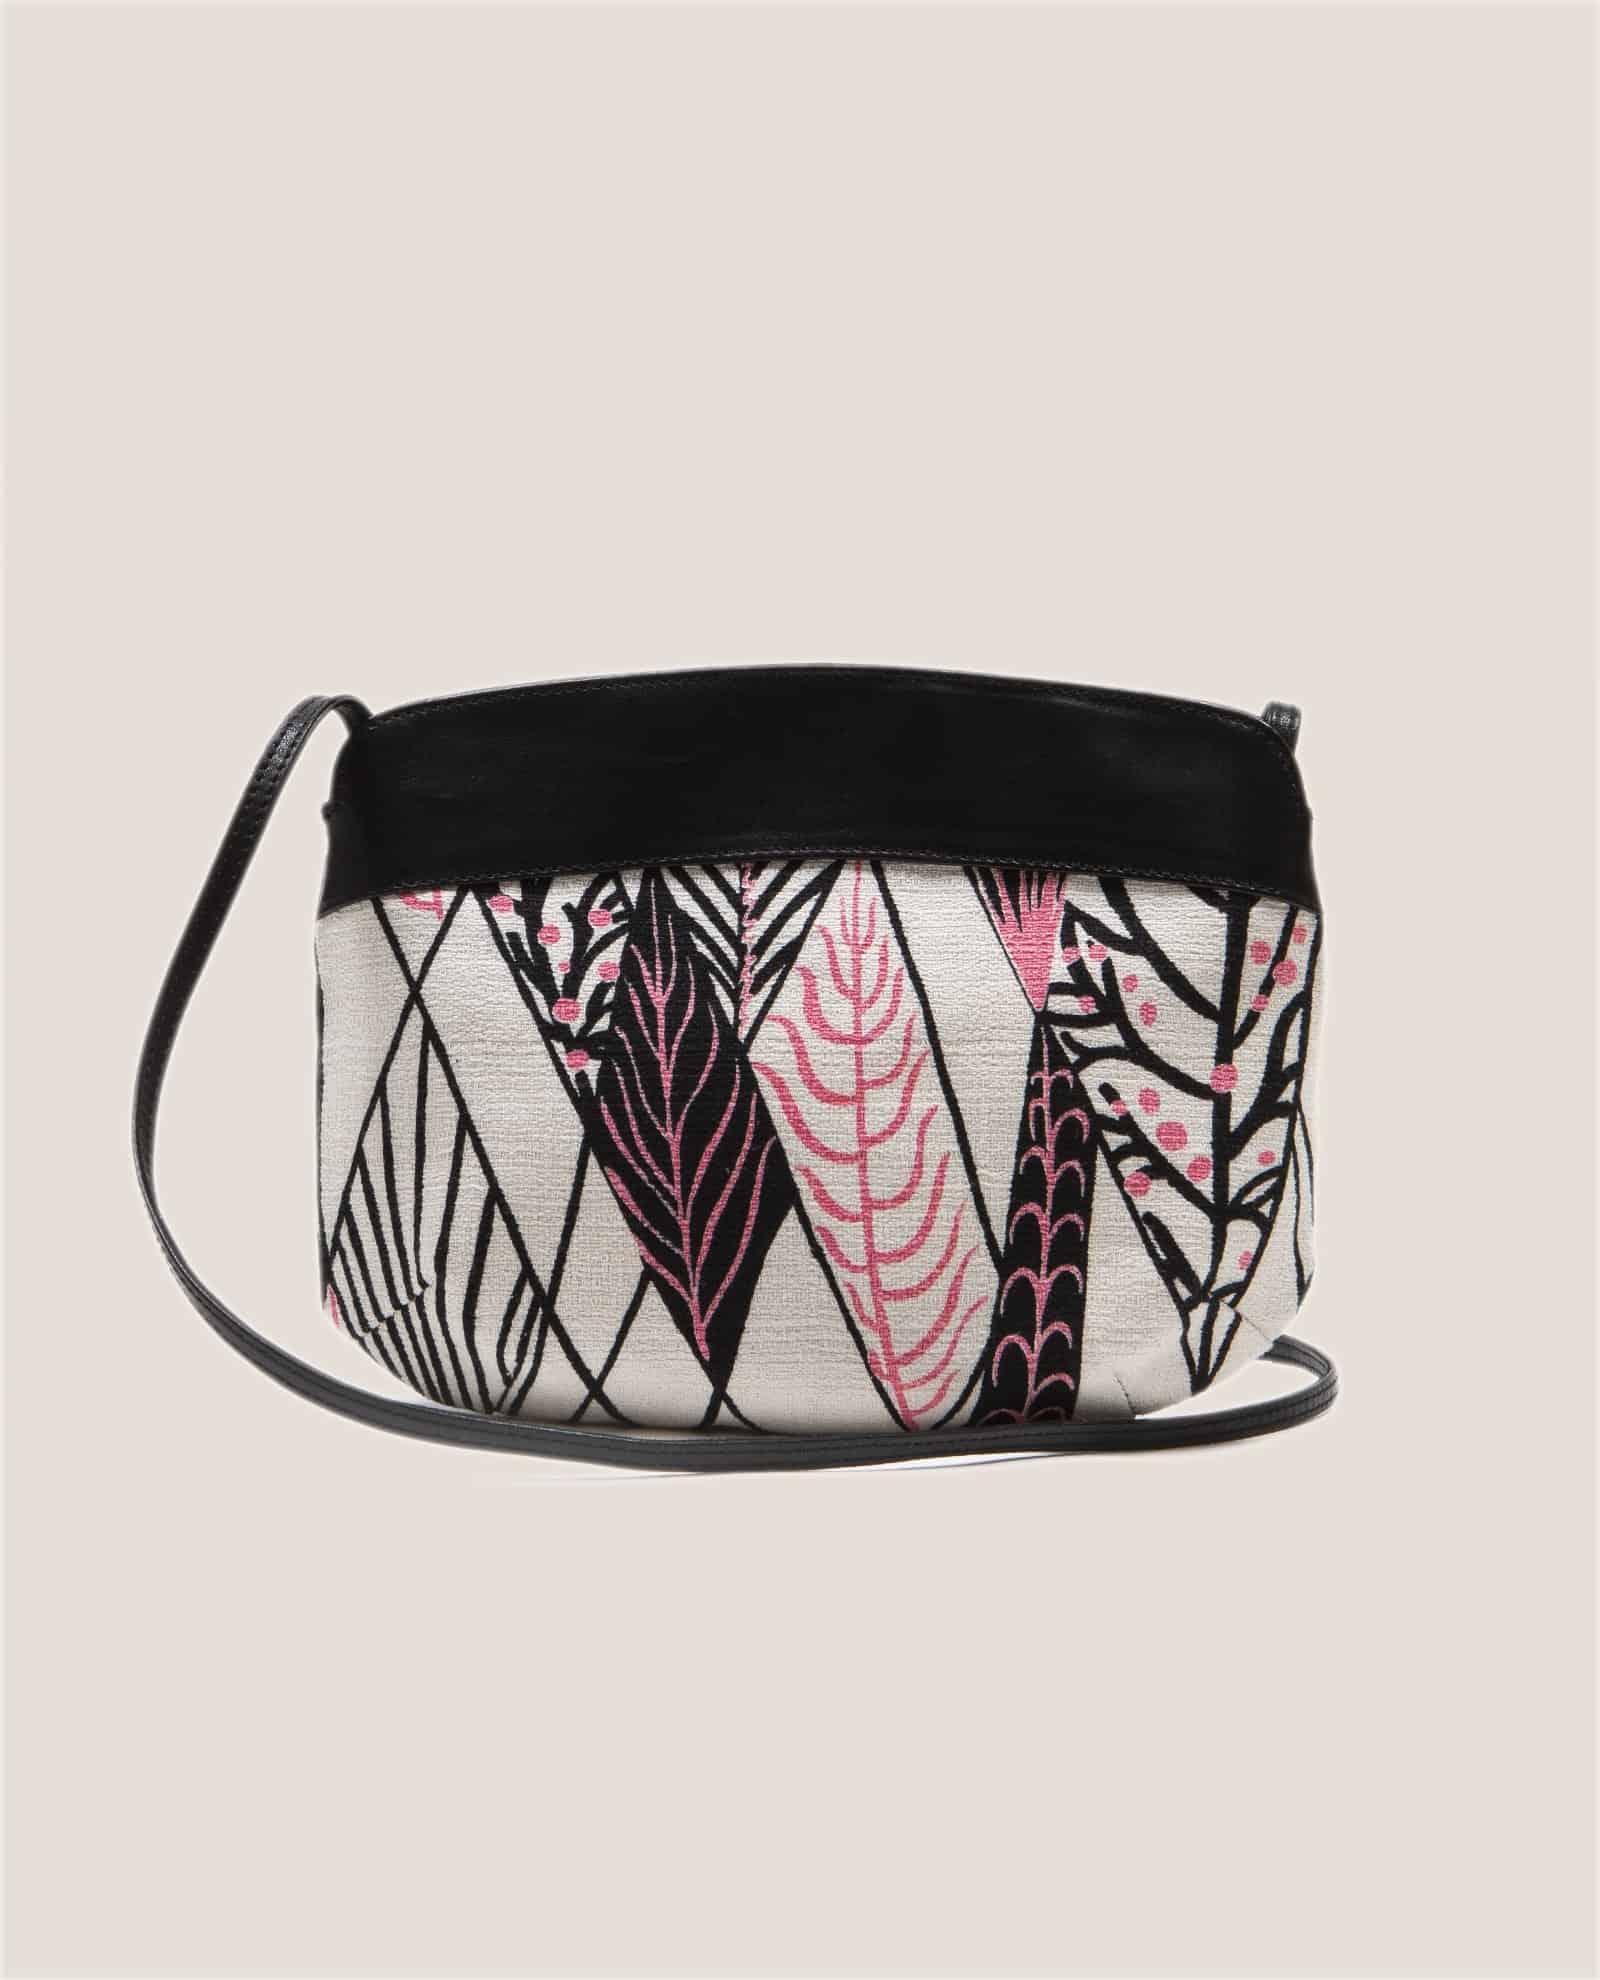 Cross Body Bag, Debbie Ula (ref #DTN-7-19) Petty Things